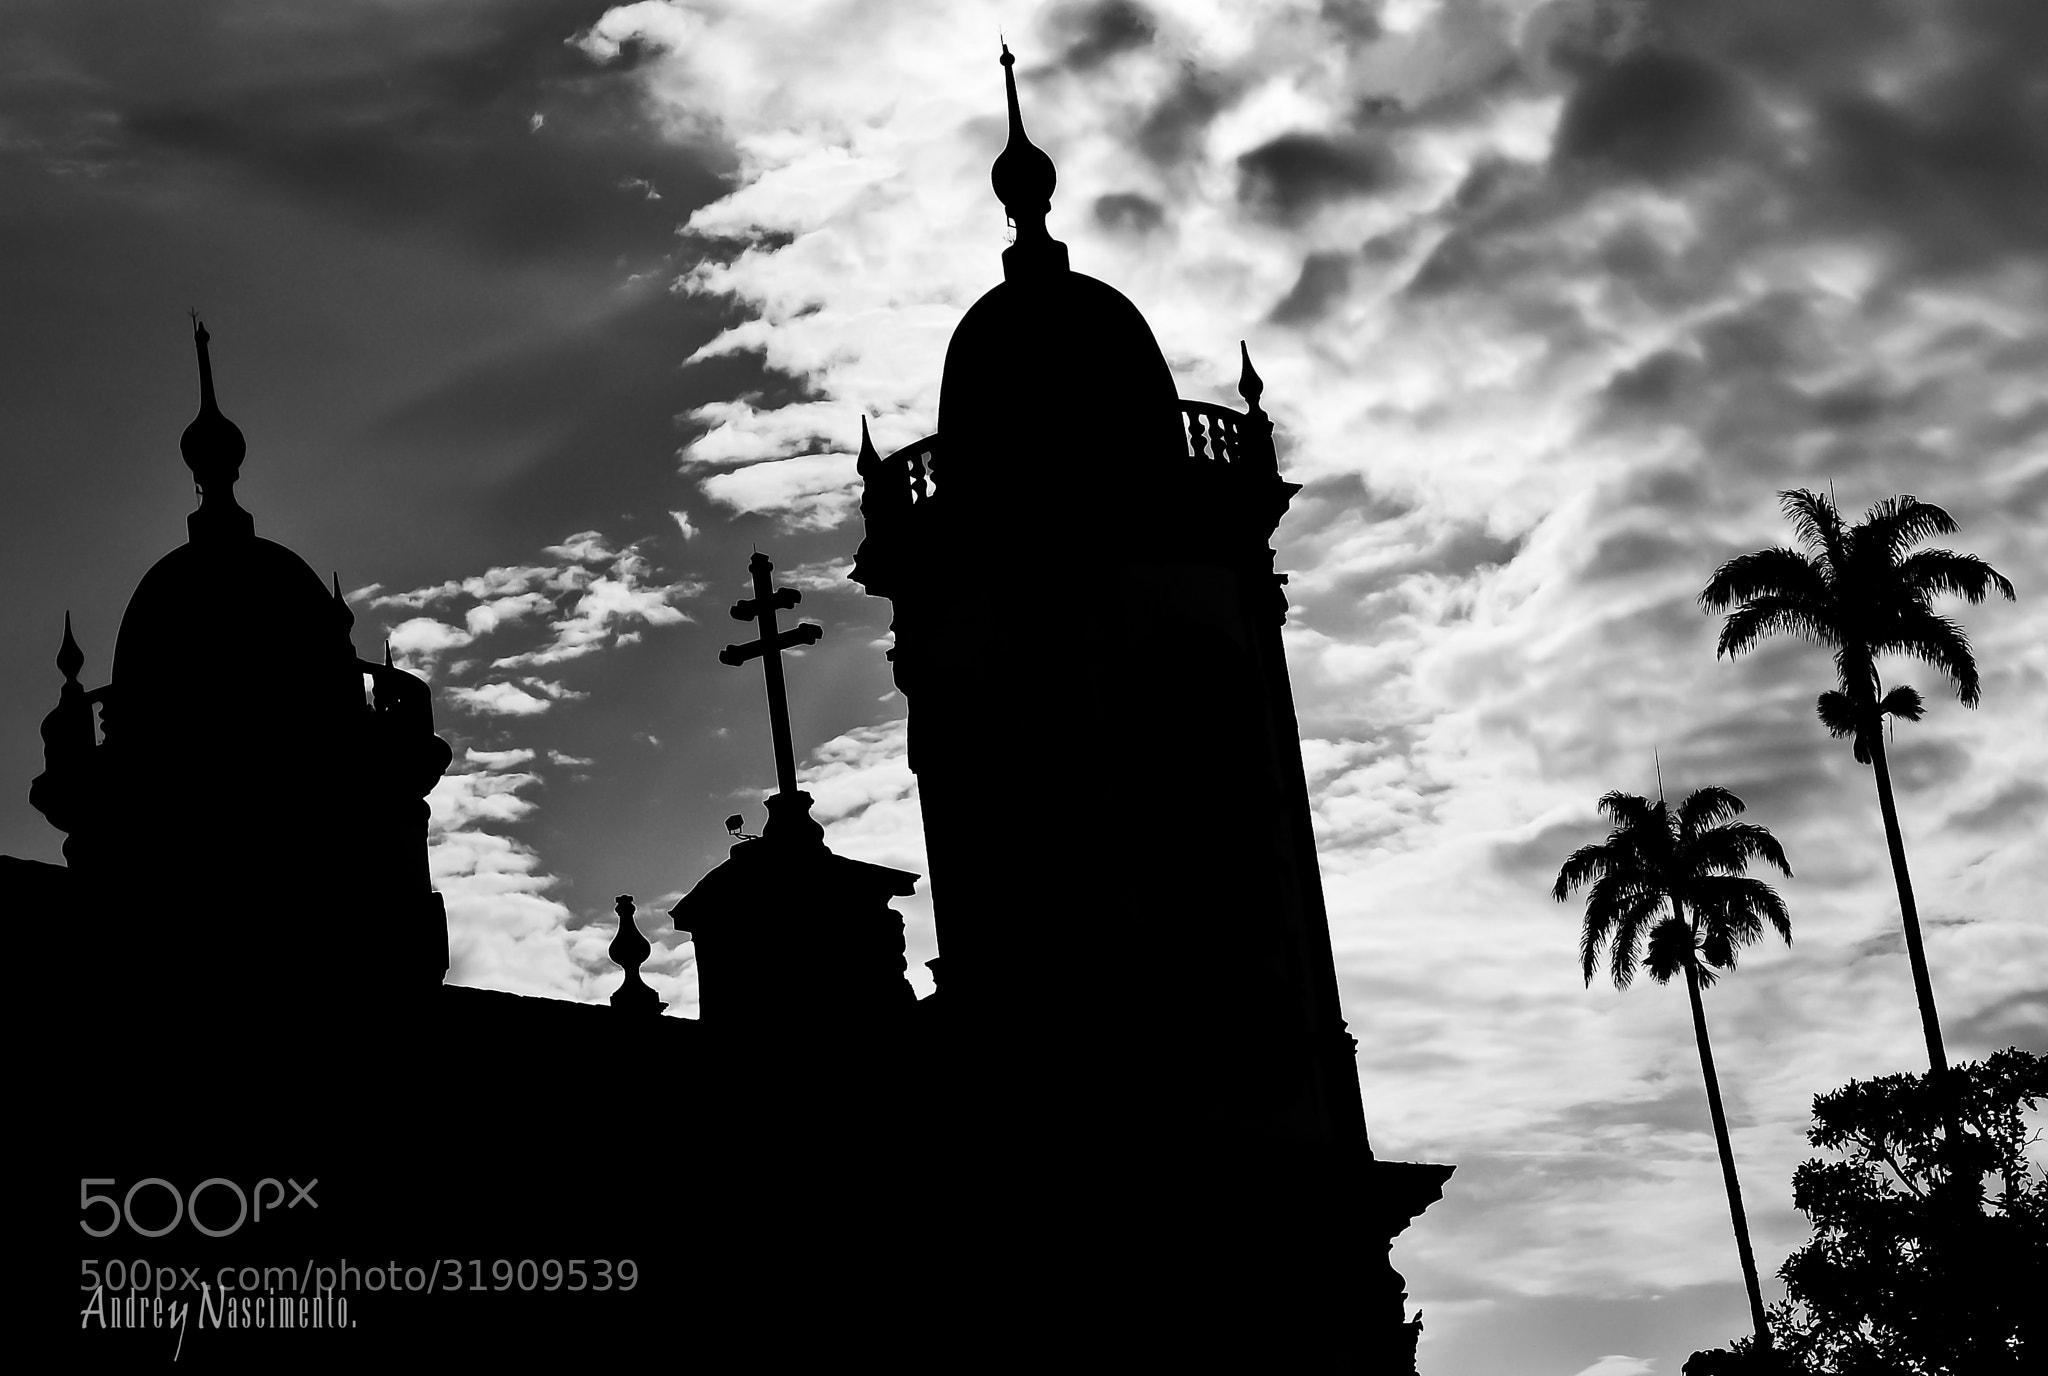 Photograph São João del Rei Church Backlighting by Andrey Nascimento on 500px